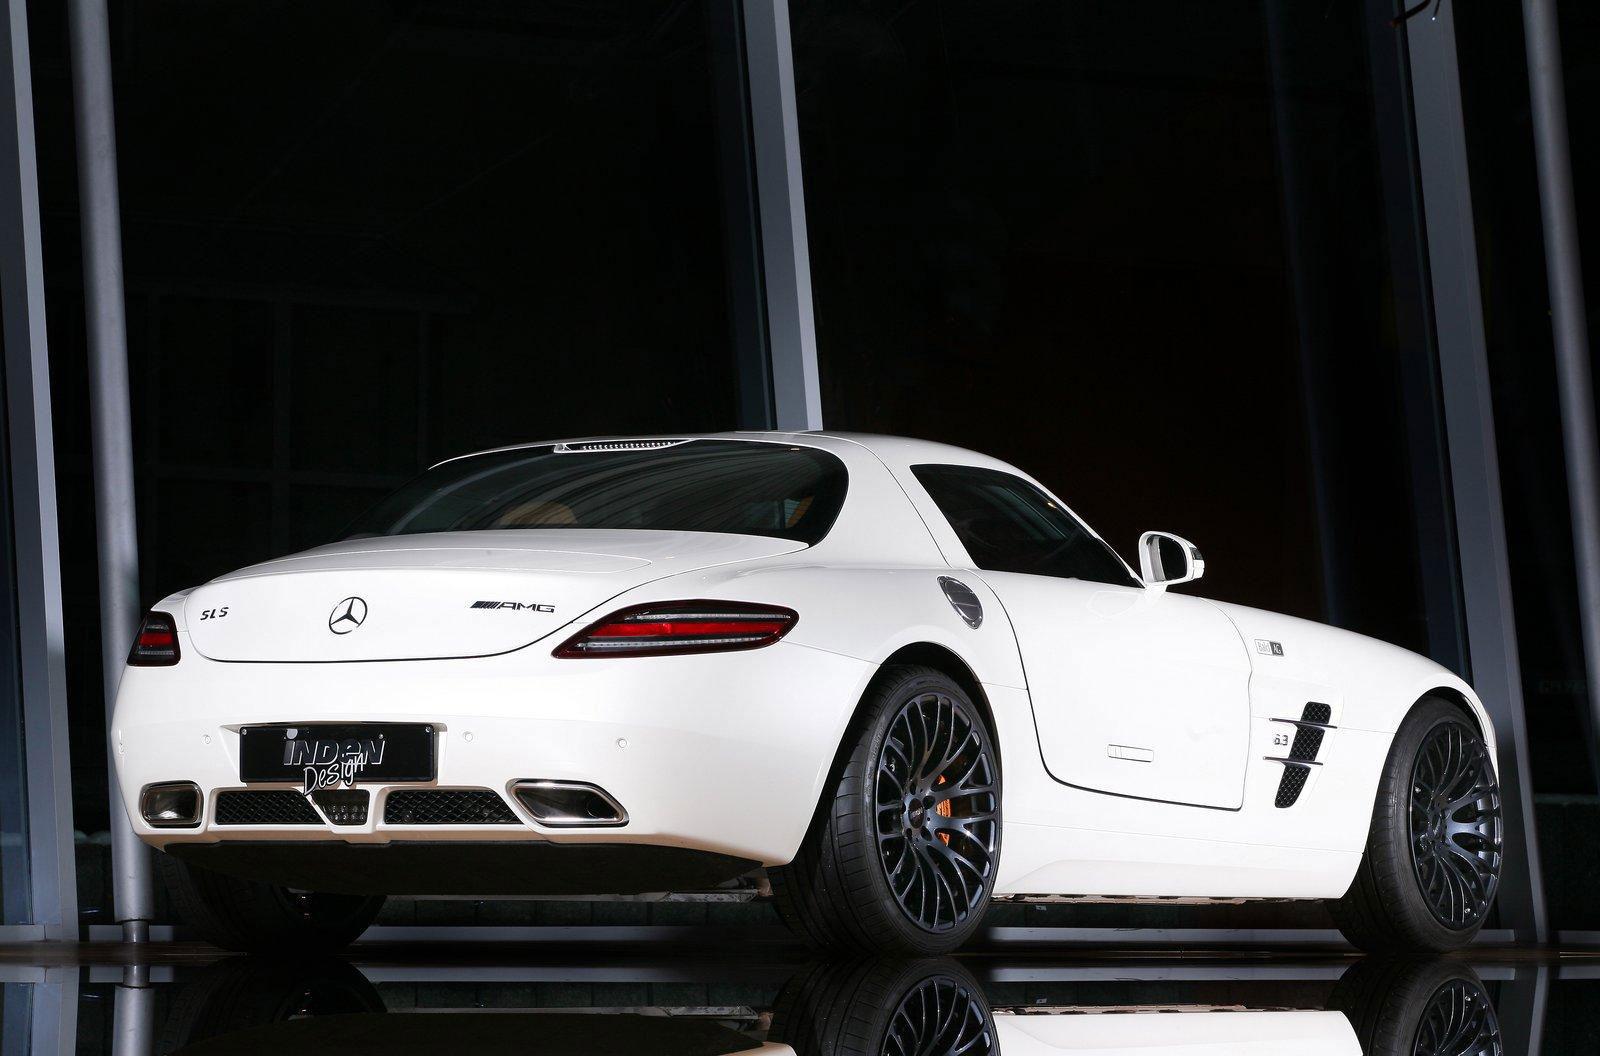 Mercedes-Benz SLS AMG dostal od Inden Design pár koní navíc 3